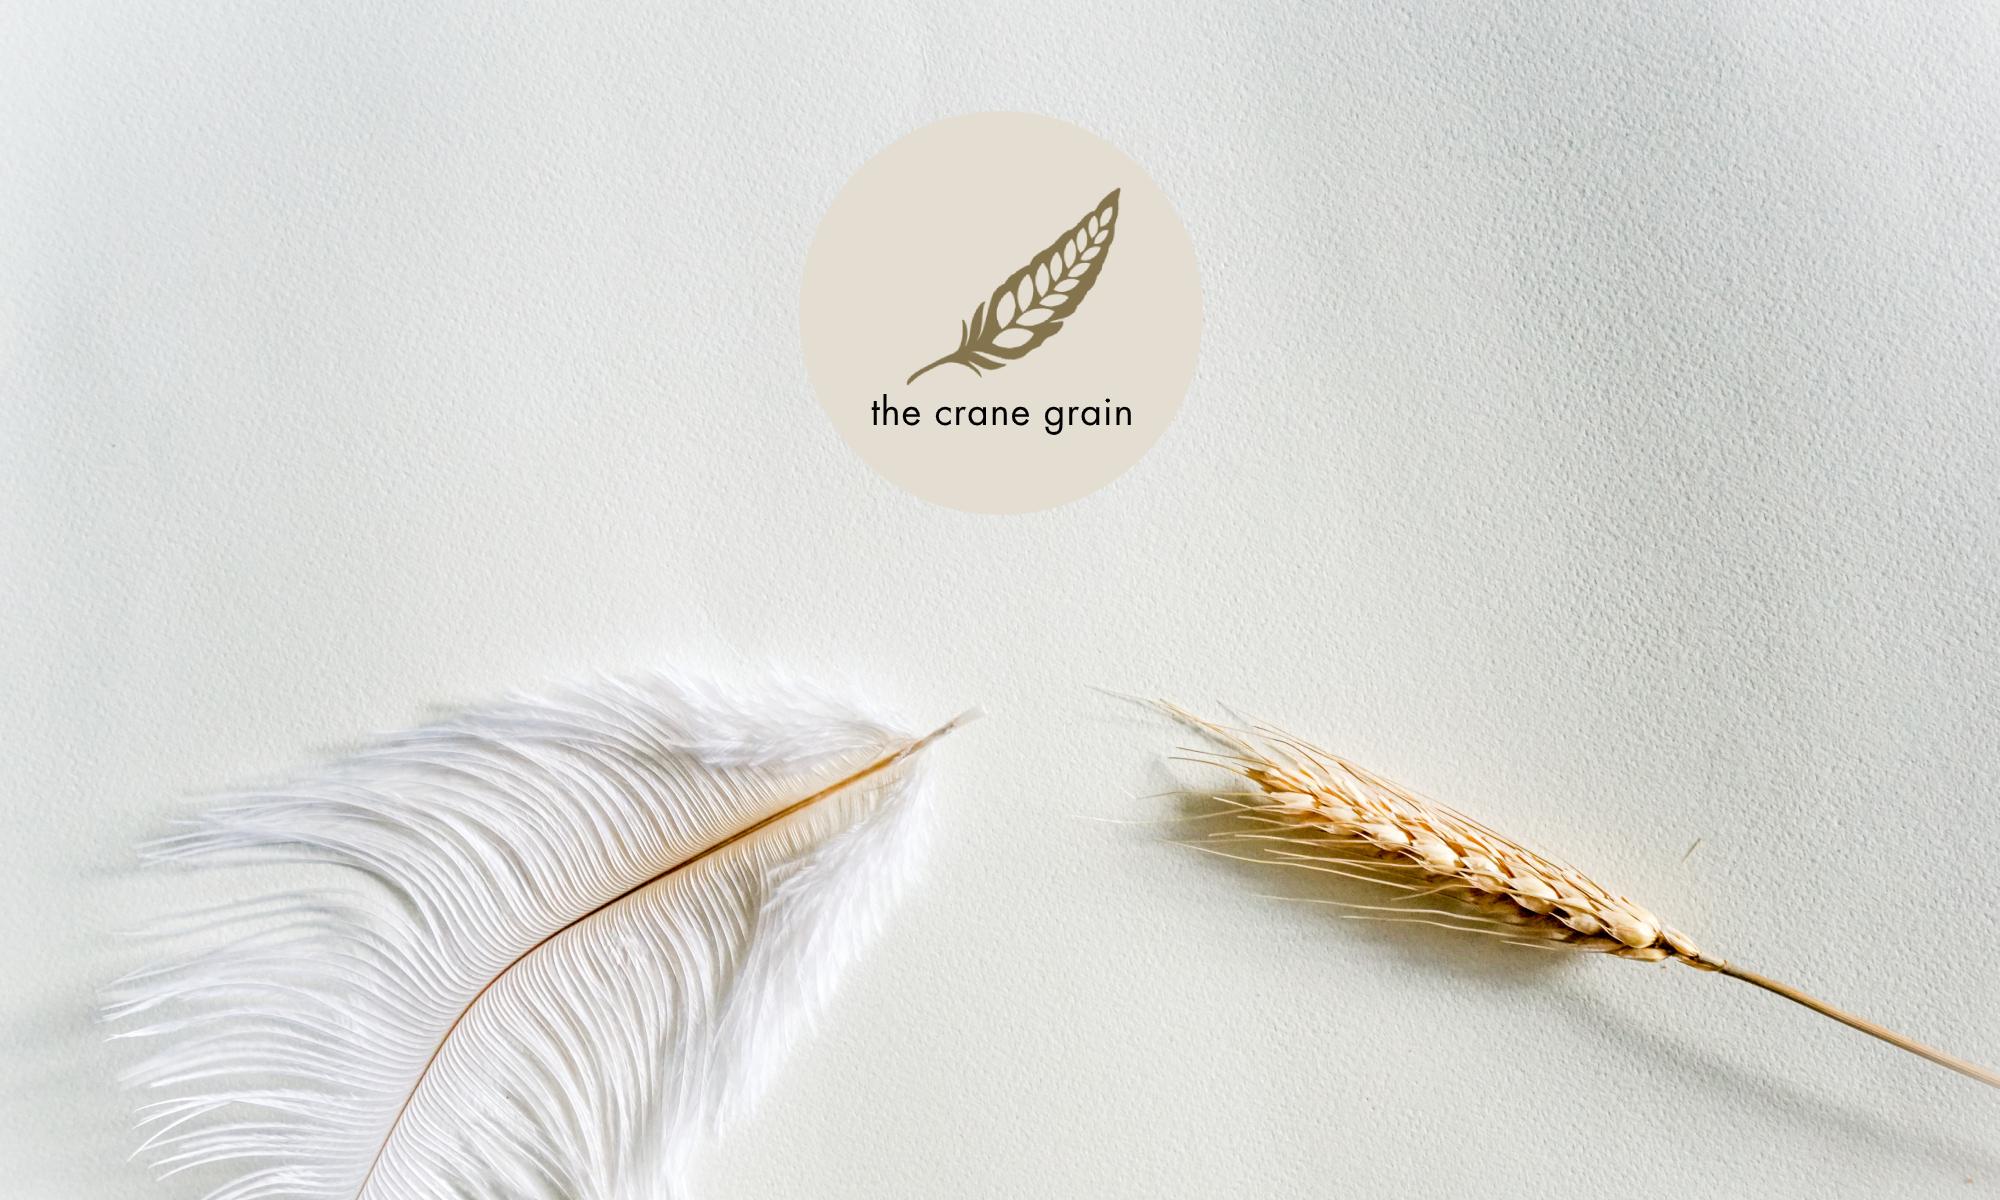 The Crane Grain -Home-based Bakeries Singapore